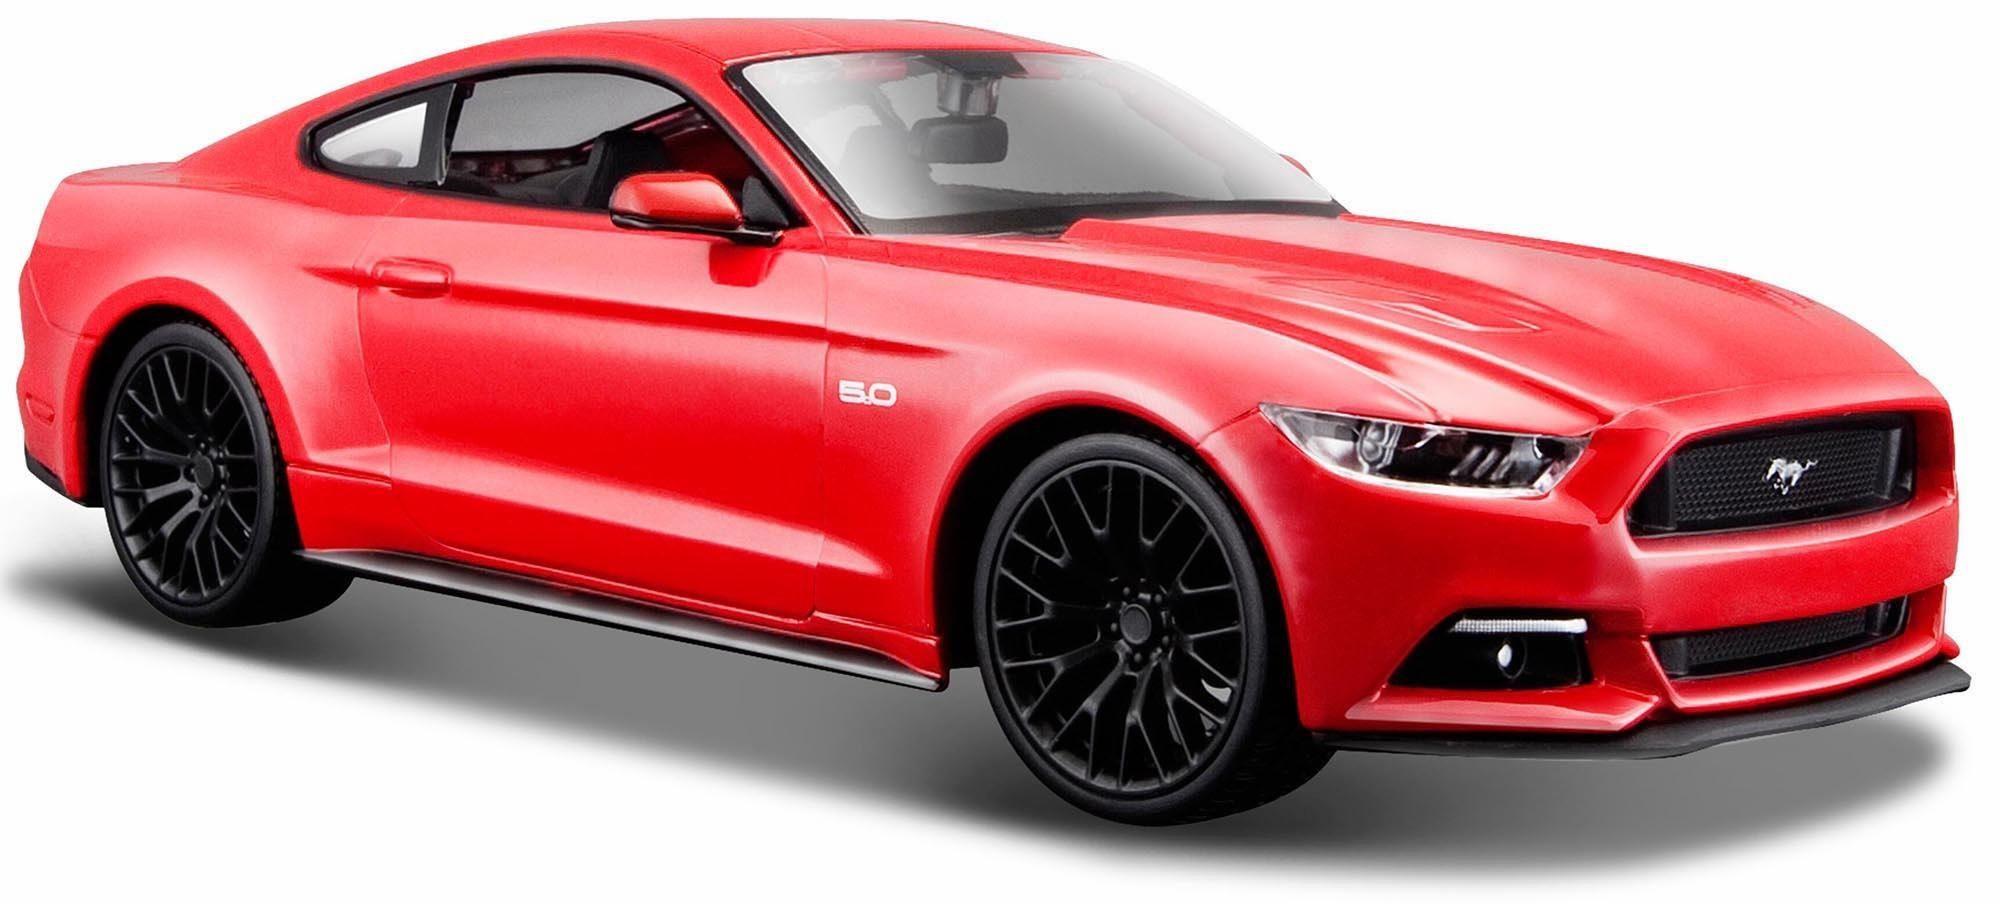 Maisto® Sammlerauto, »Ford Mustang GT 15, 1:24, rot«